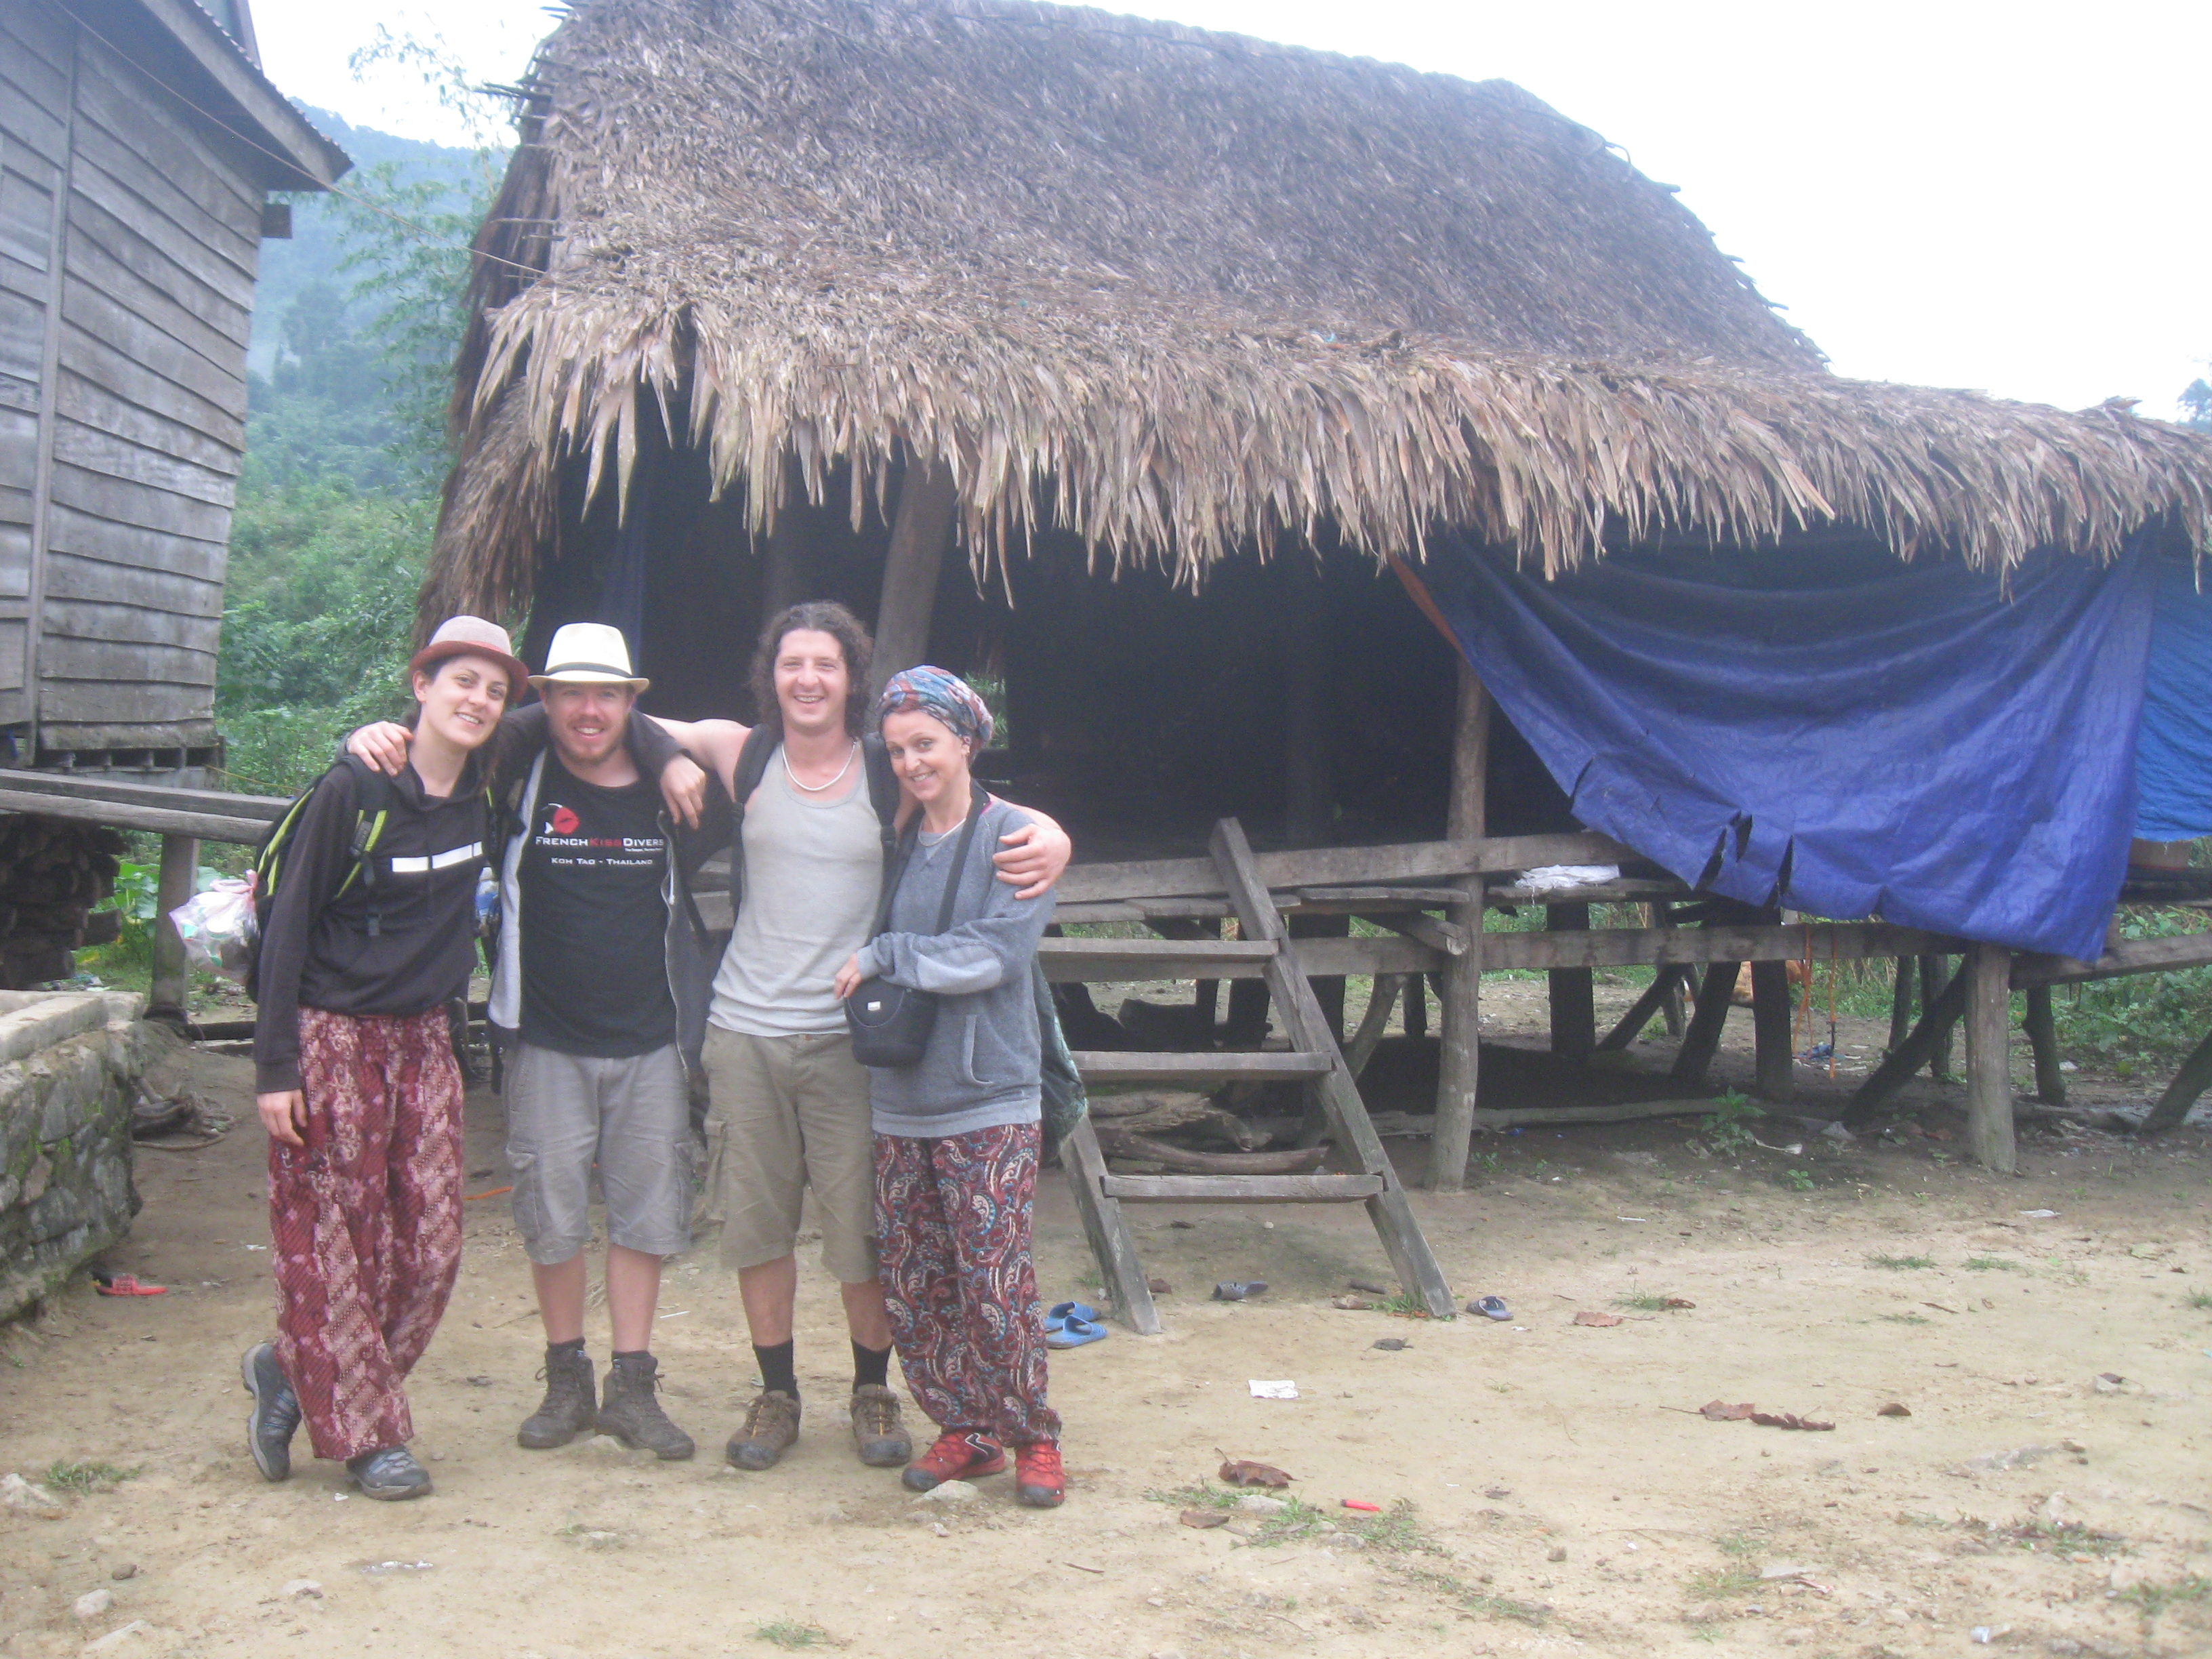 Phong Nha Trekking tour